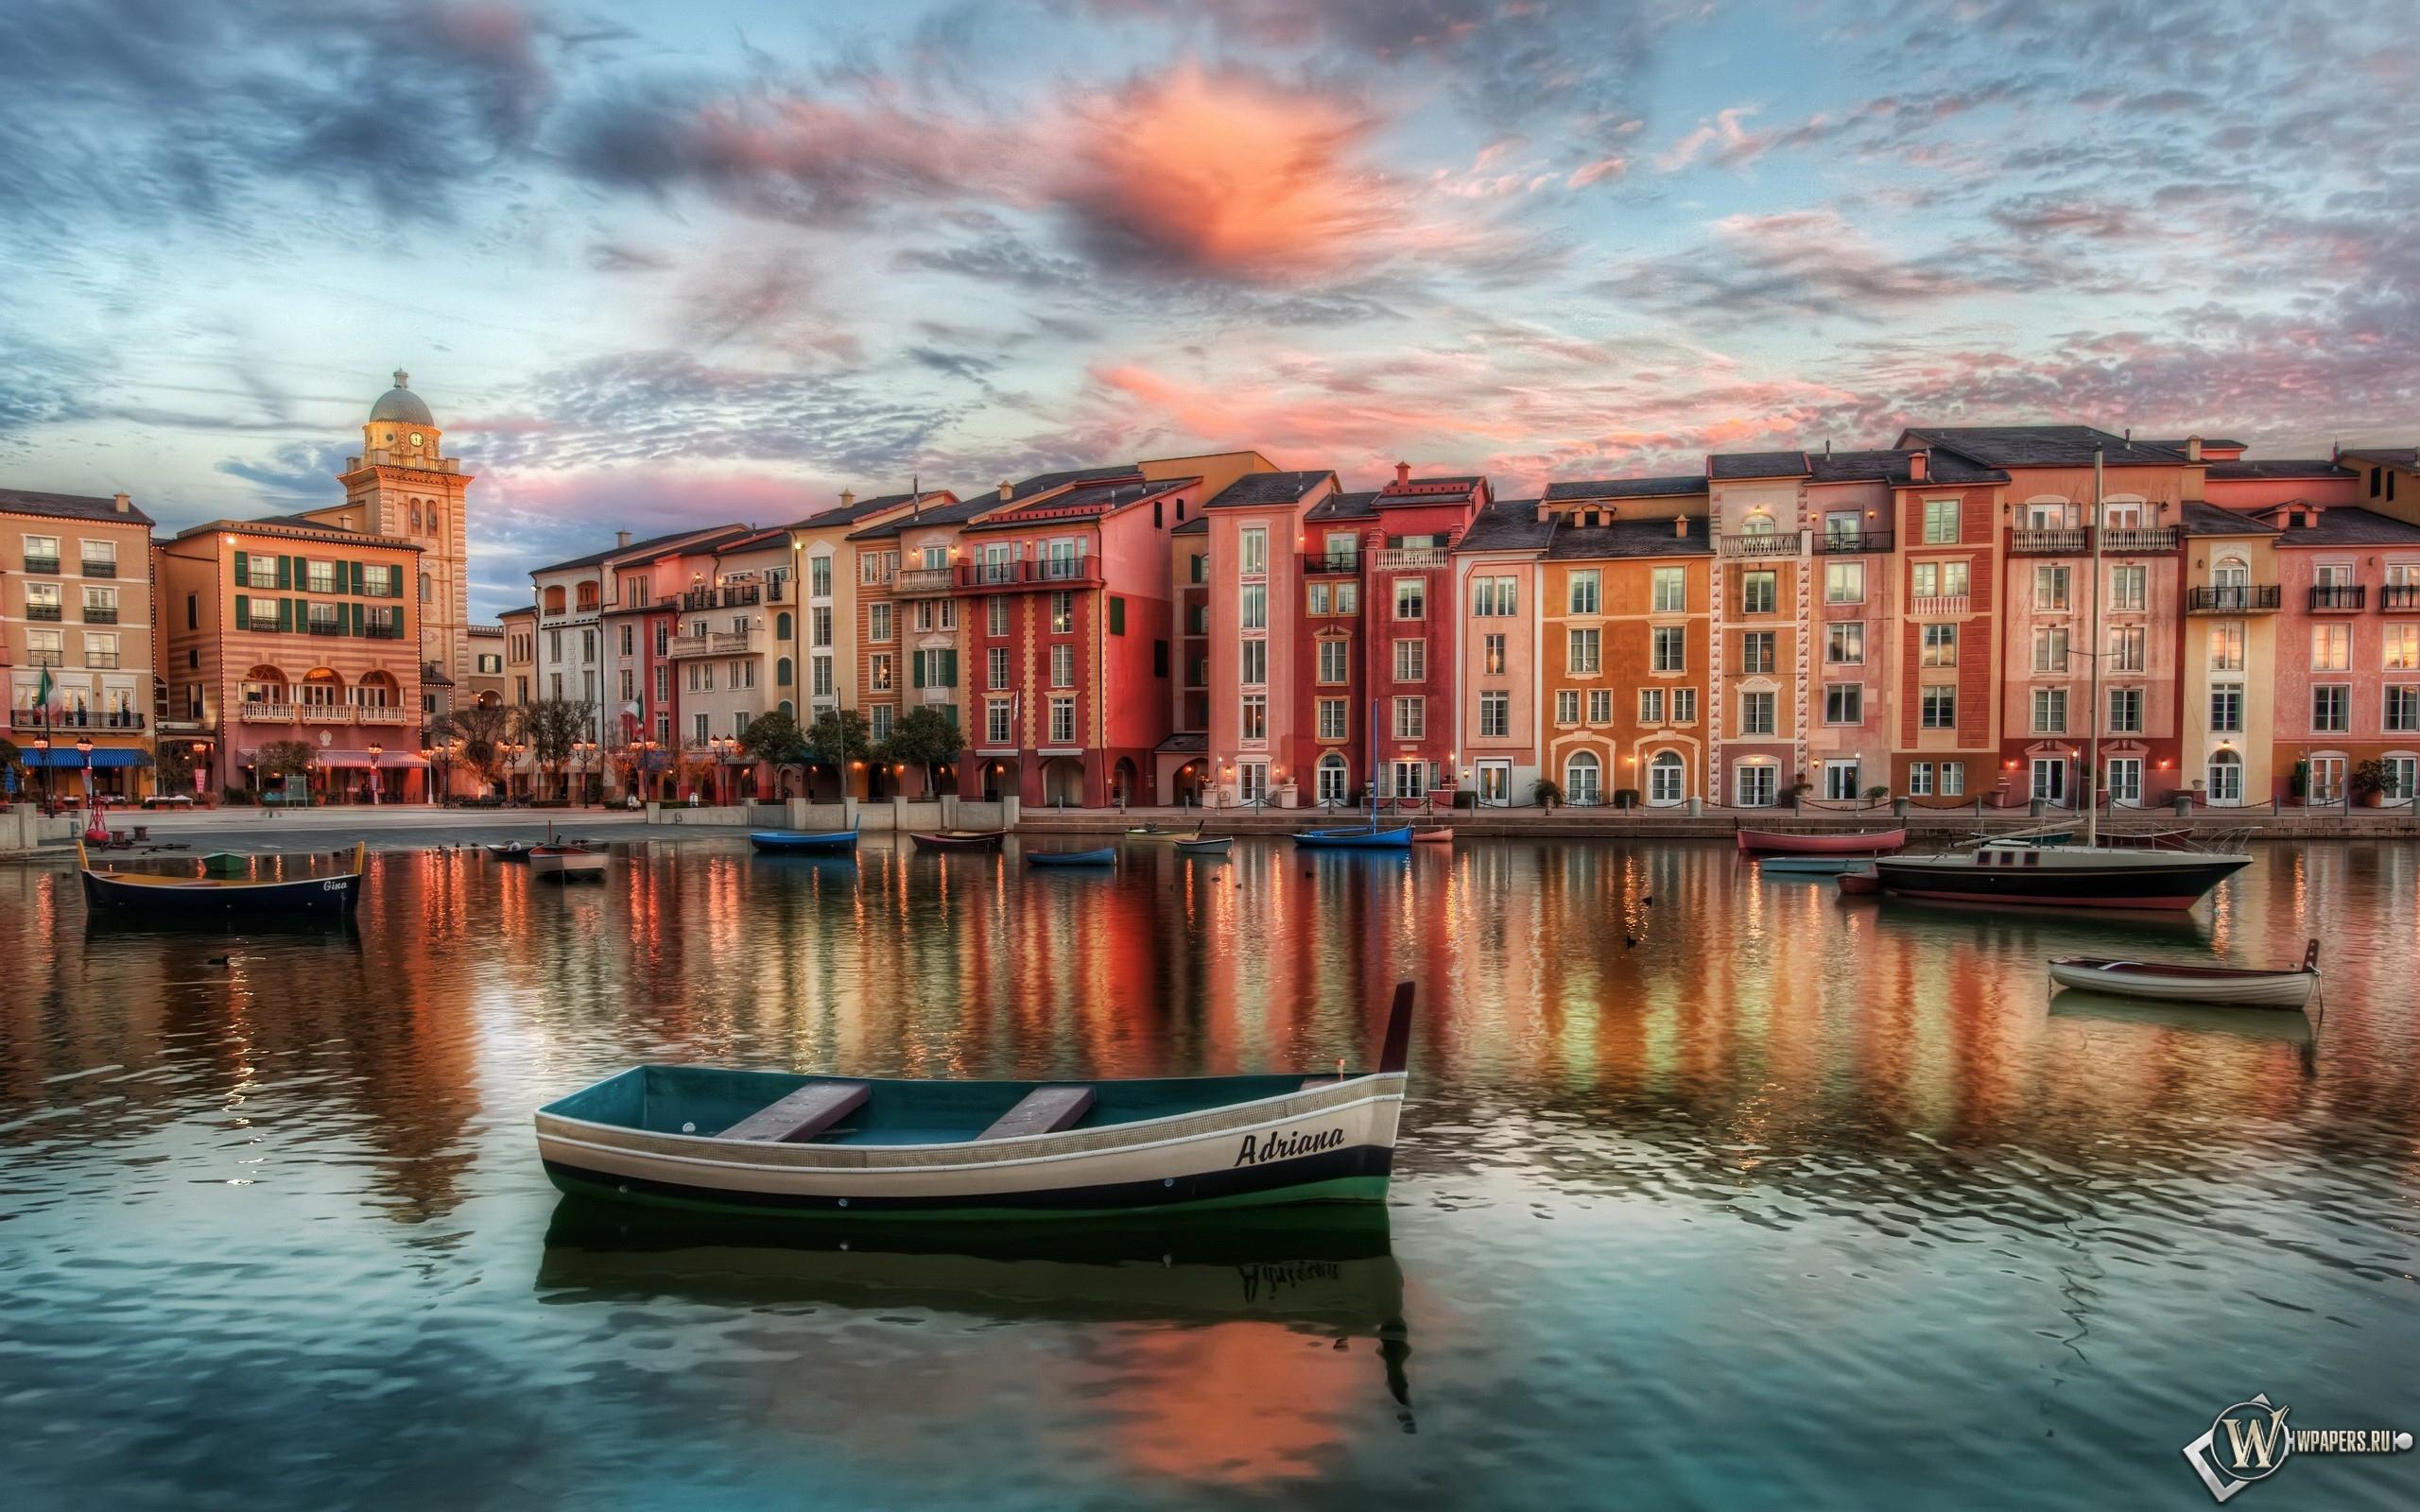 Тихое утро в Венеции (Италия) 2560x1600